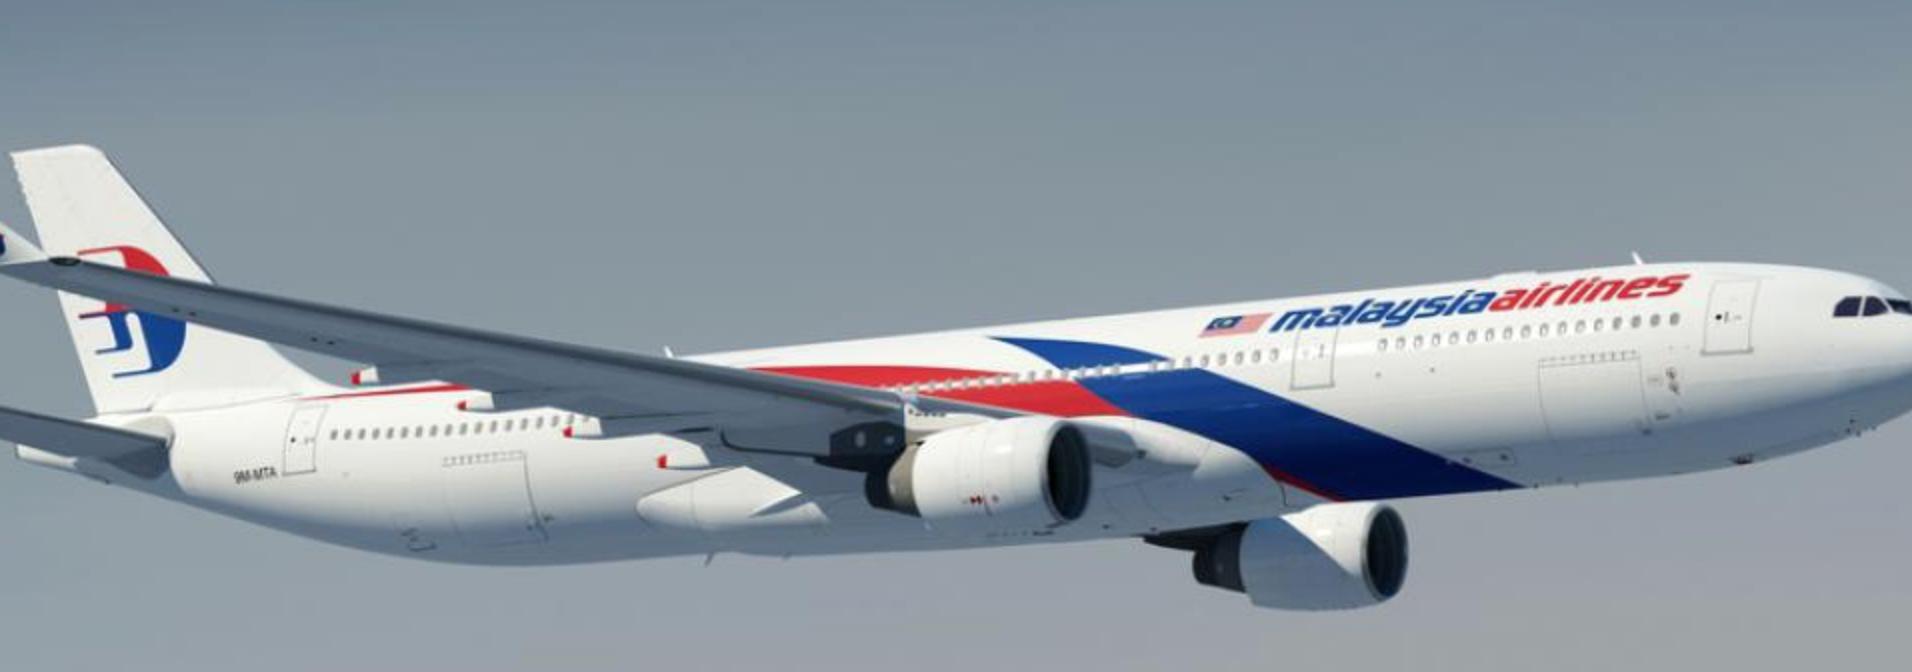 Vol Mh370 De La Malaysia Airlines Crash Dans Le Detroit De Malacca